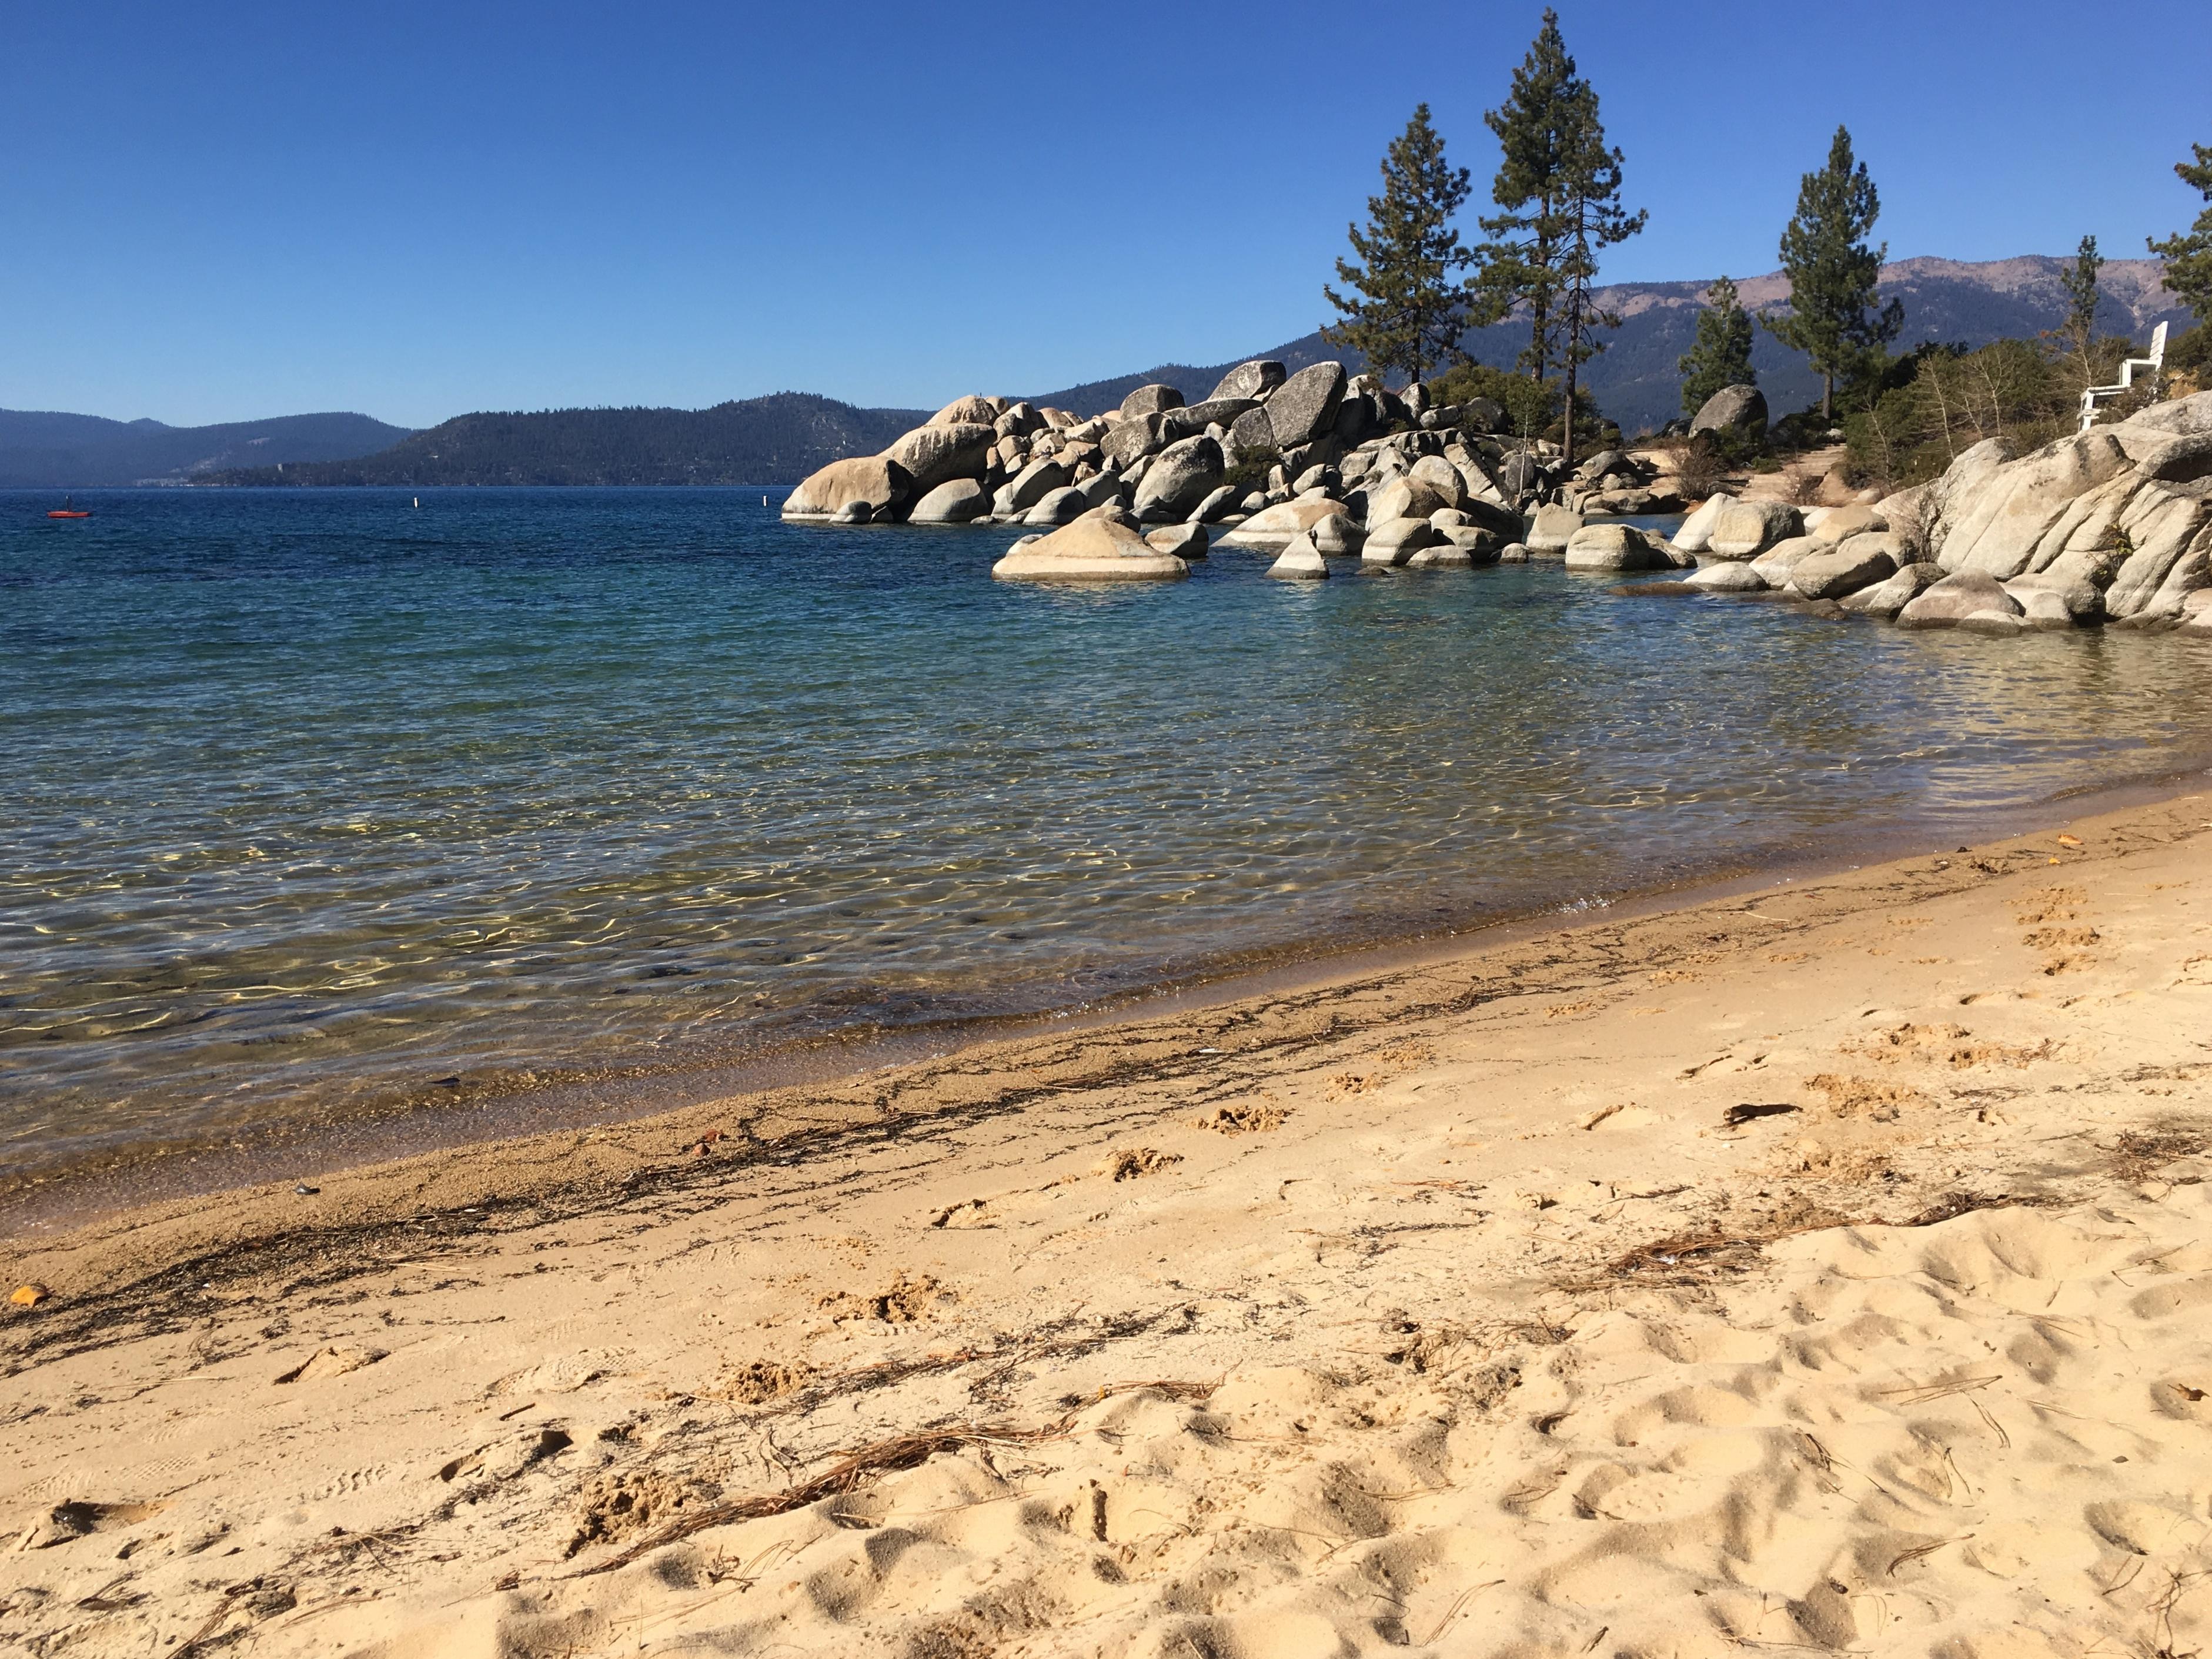 Lake Tahoe, Sand Harbor Park, Bay, Beach, Landscape, Mountain, HQ Photo